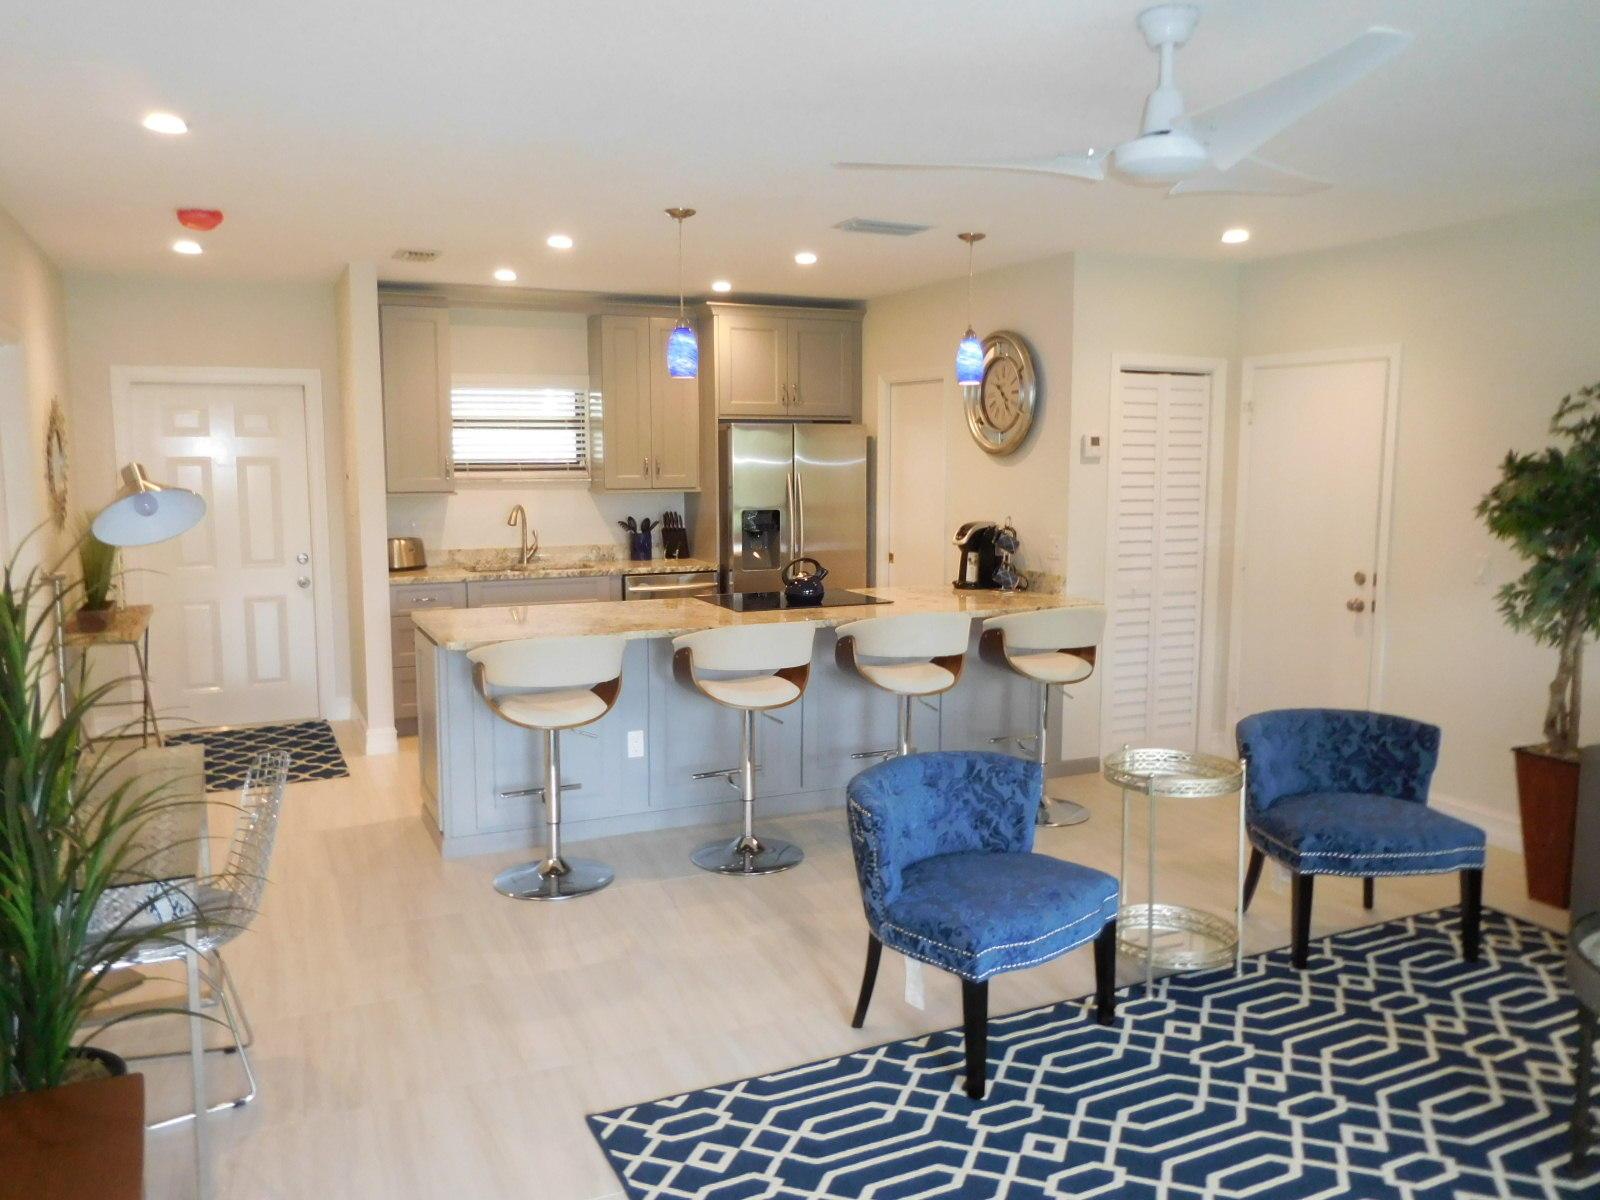 13334 Polo Club Road, Wellington, Florida 33414, 2 Bedrooms Bedrooms, ,2 BathroomsBathrooms,Condo/Coop,For Rent,Palm Beach Polo,Polo Club,2,RX-10544867